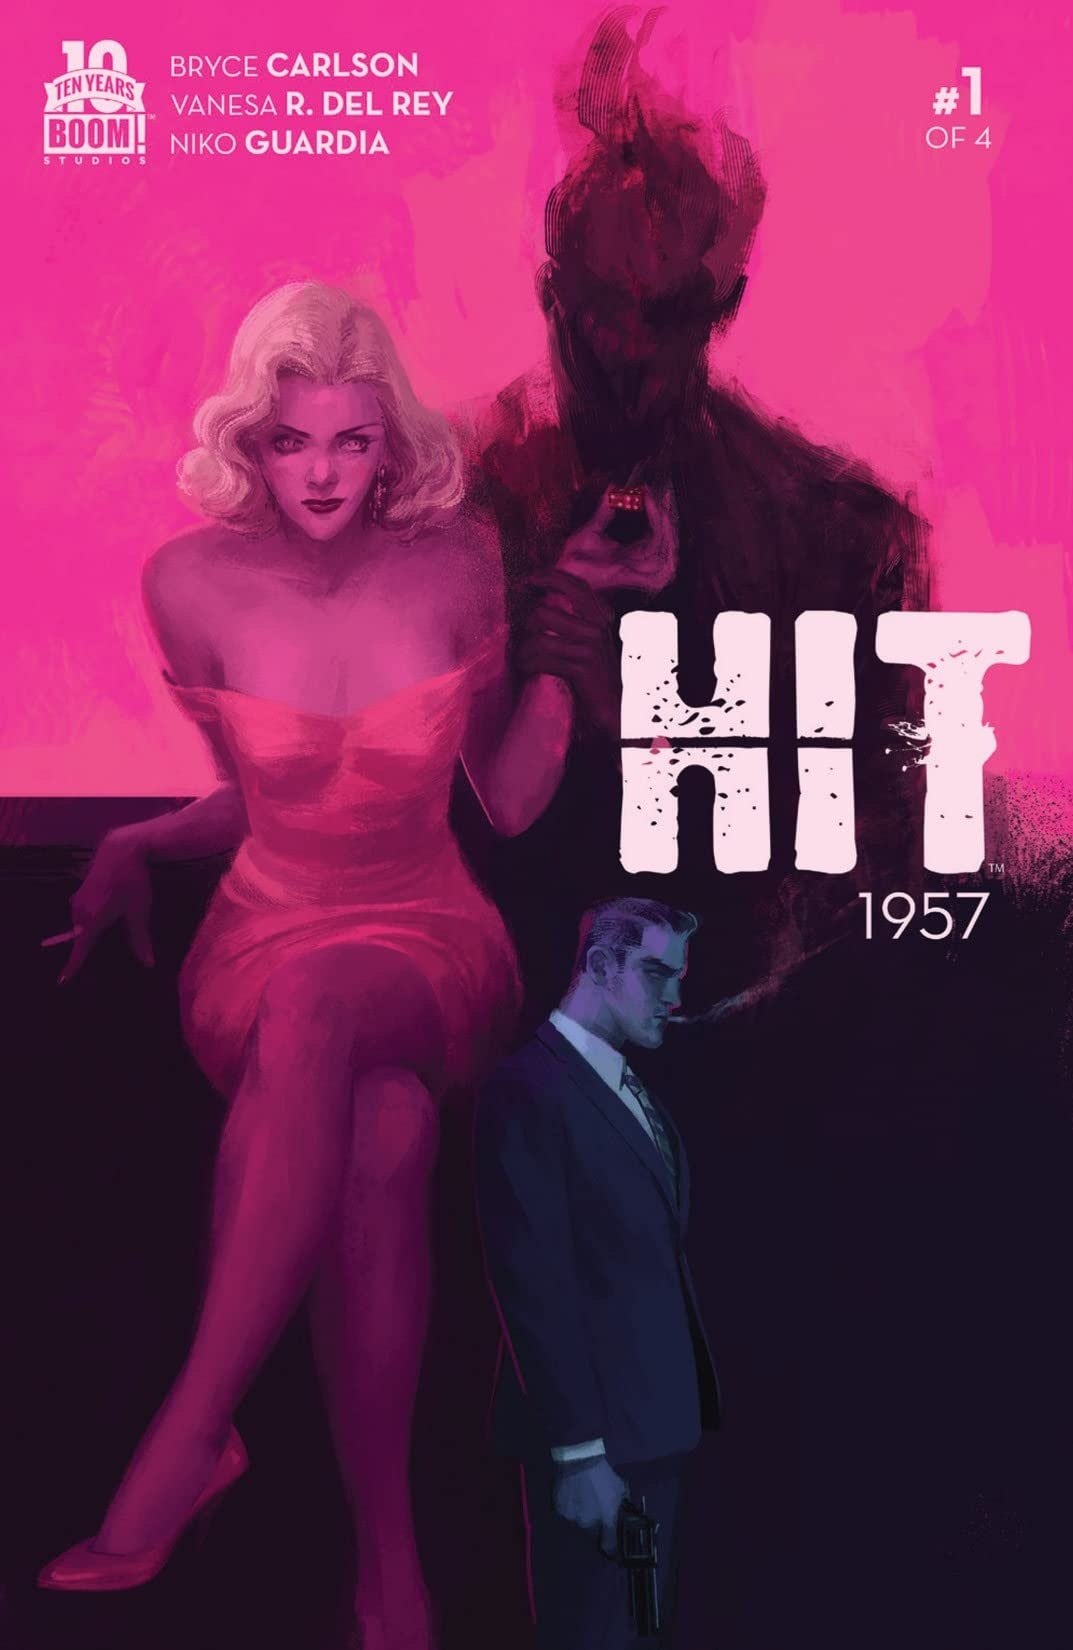 Hit: 1957 #1